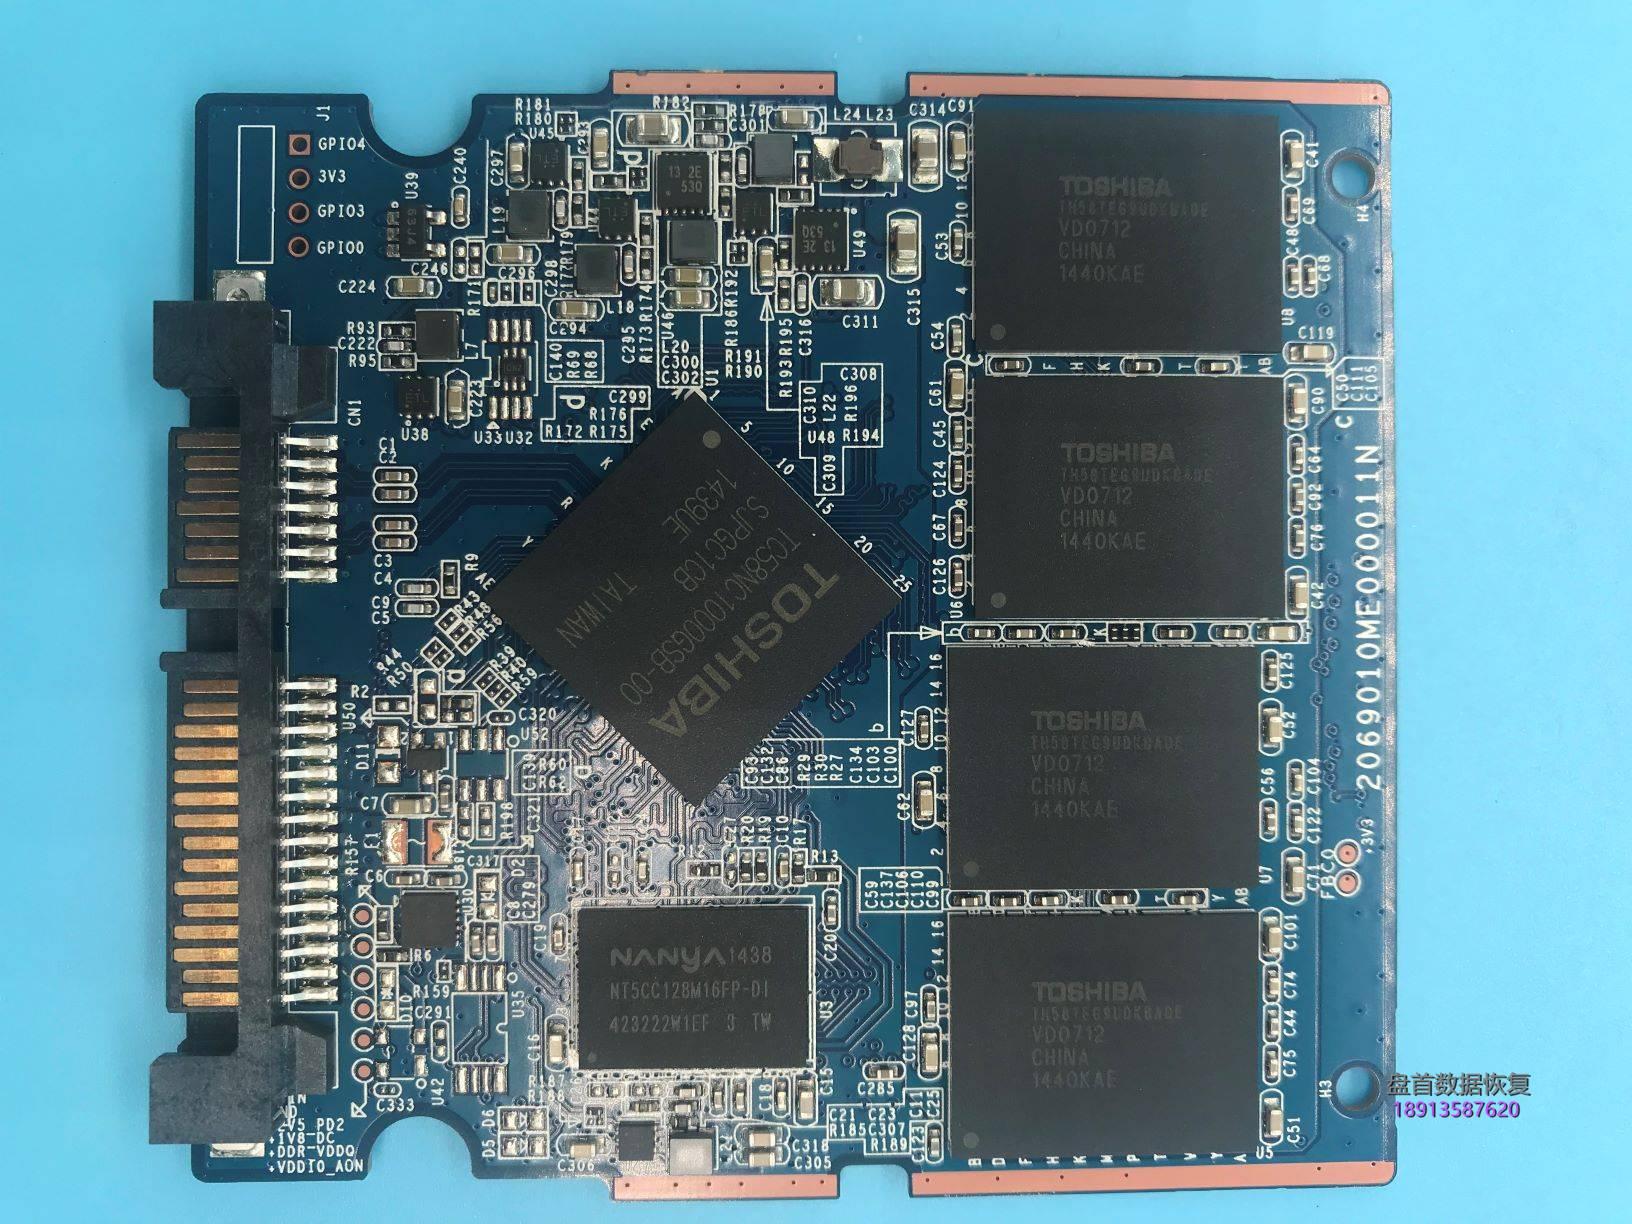 0-10 240G东芝Q300掉盘王TC58NC1000GSB-00掉盘无法识别SSD完美修复成功